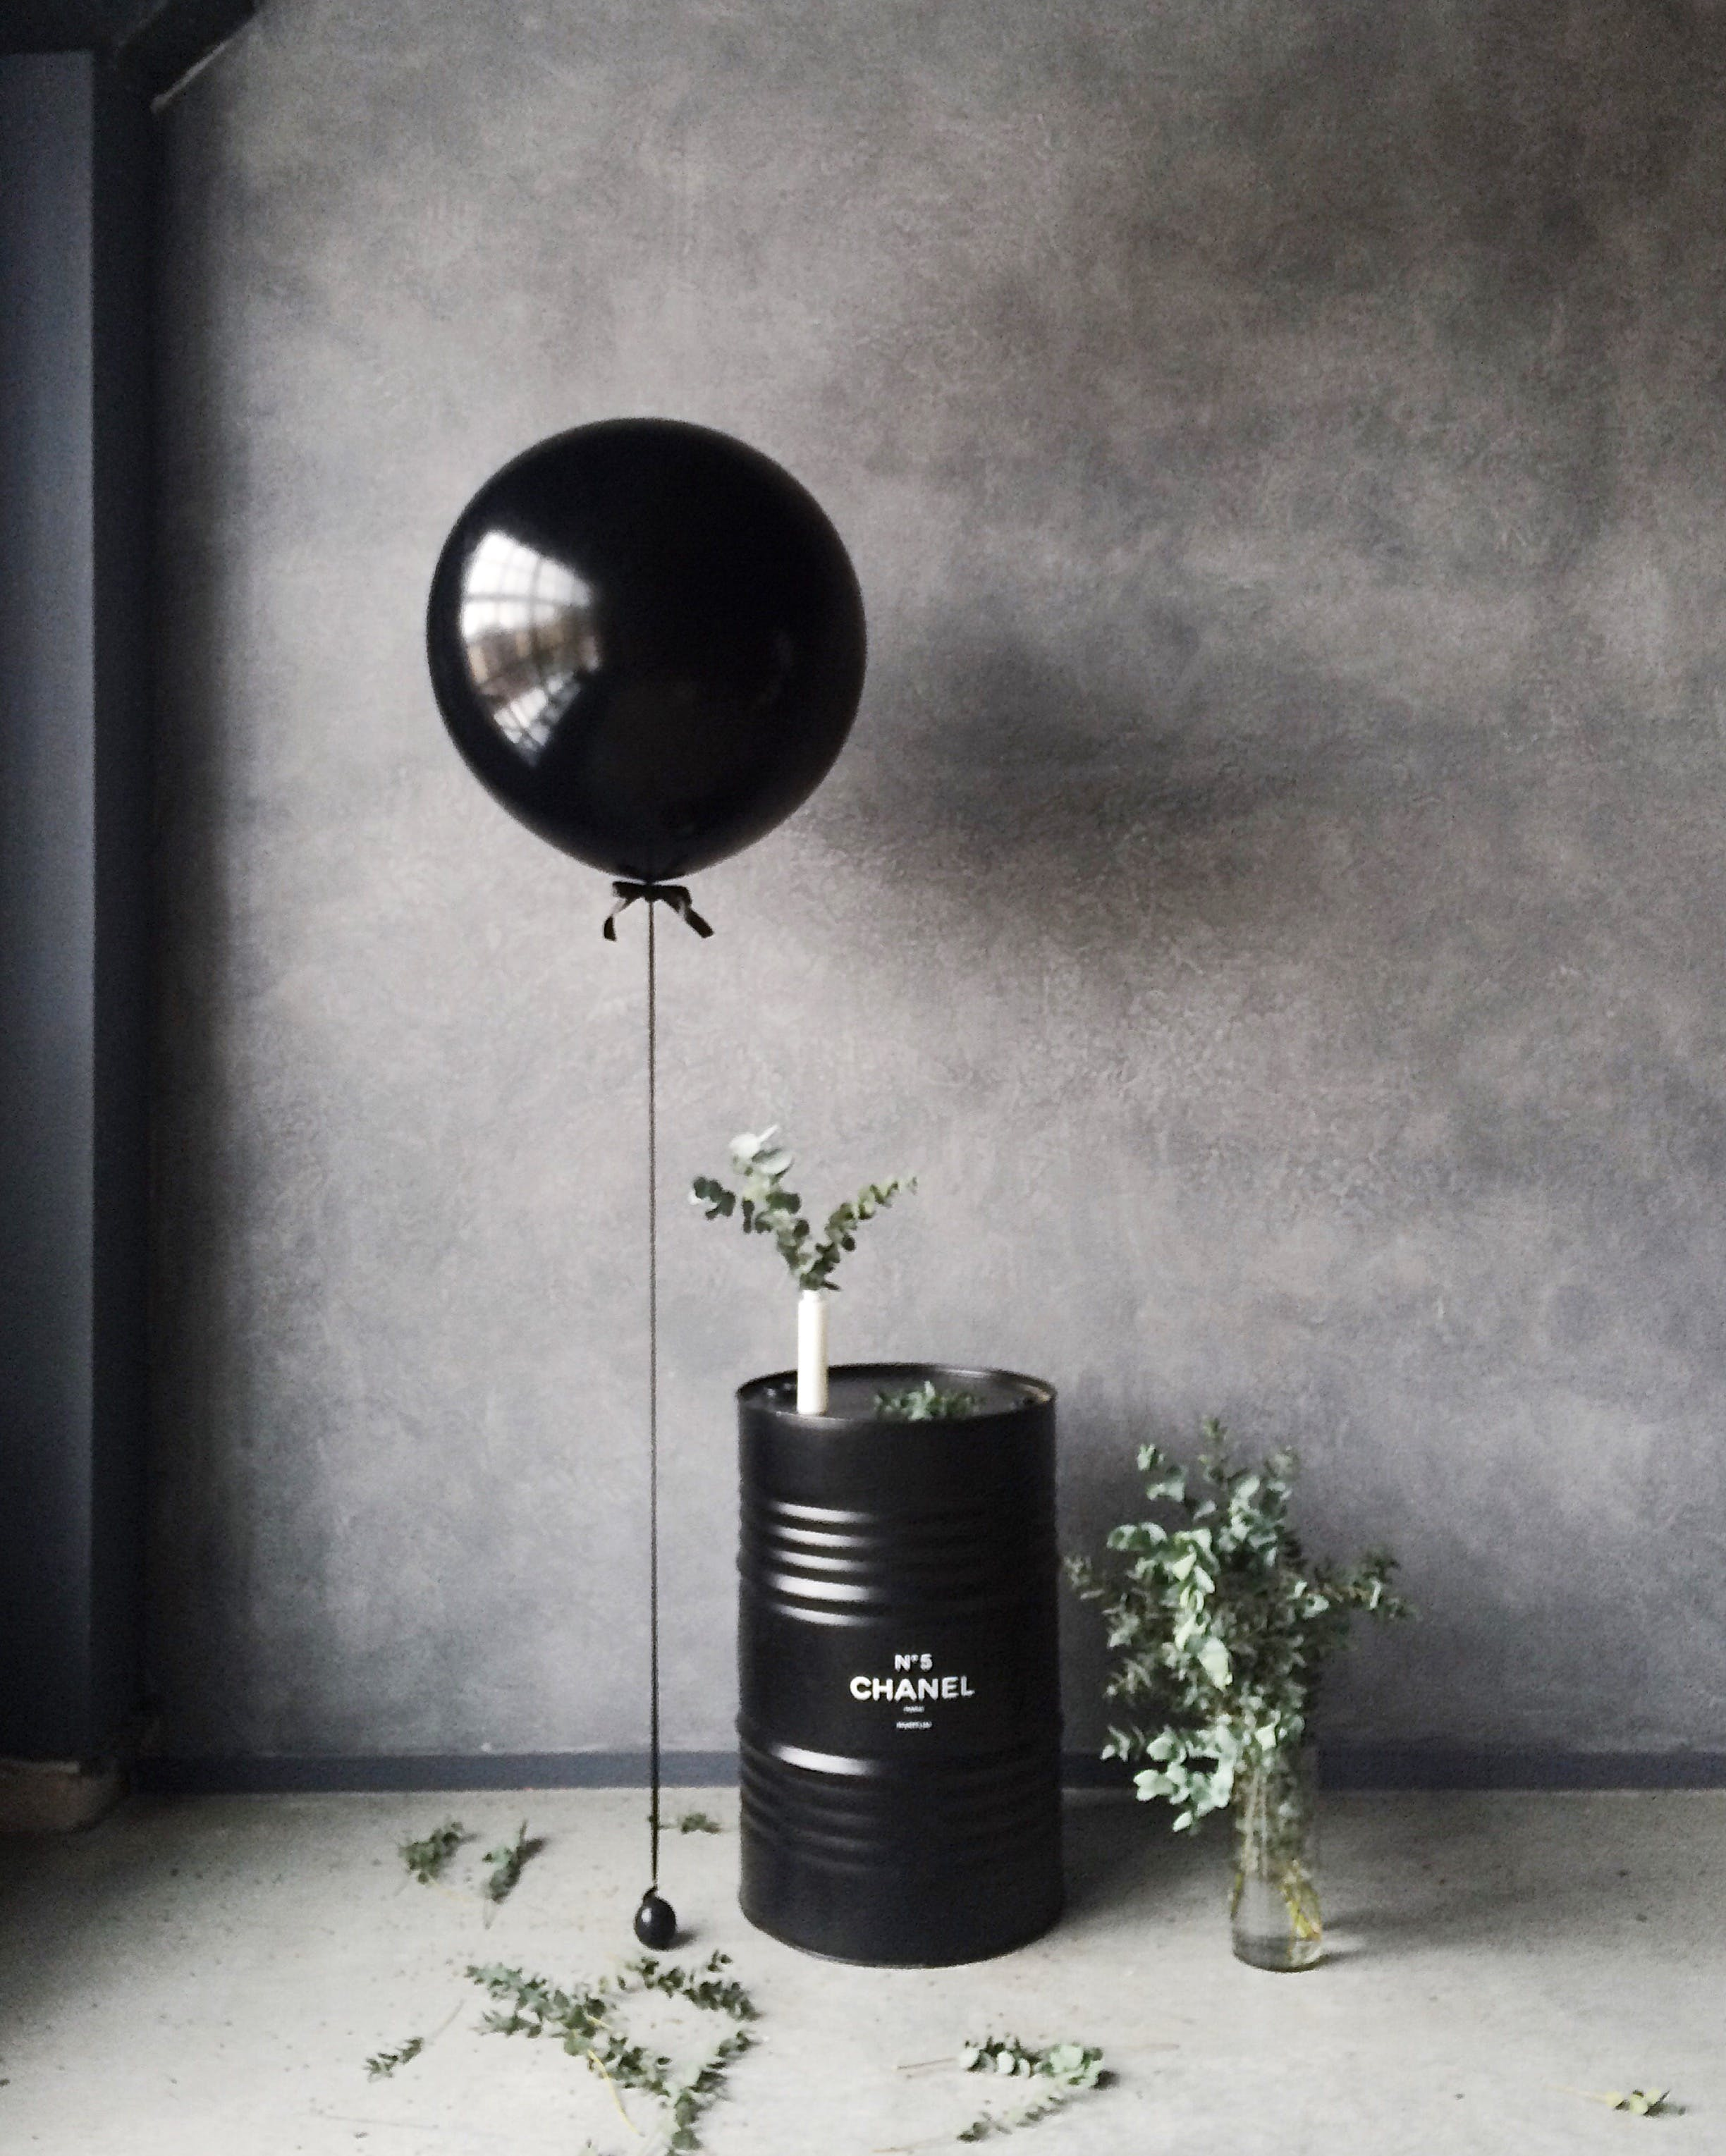 Grayscale Photography of Balloon Beside Chanel Metal Barrel